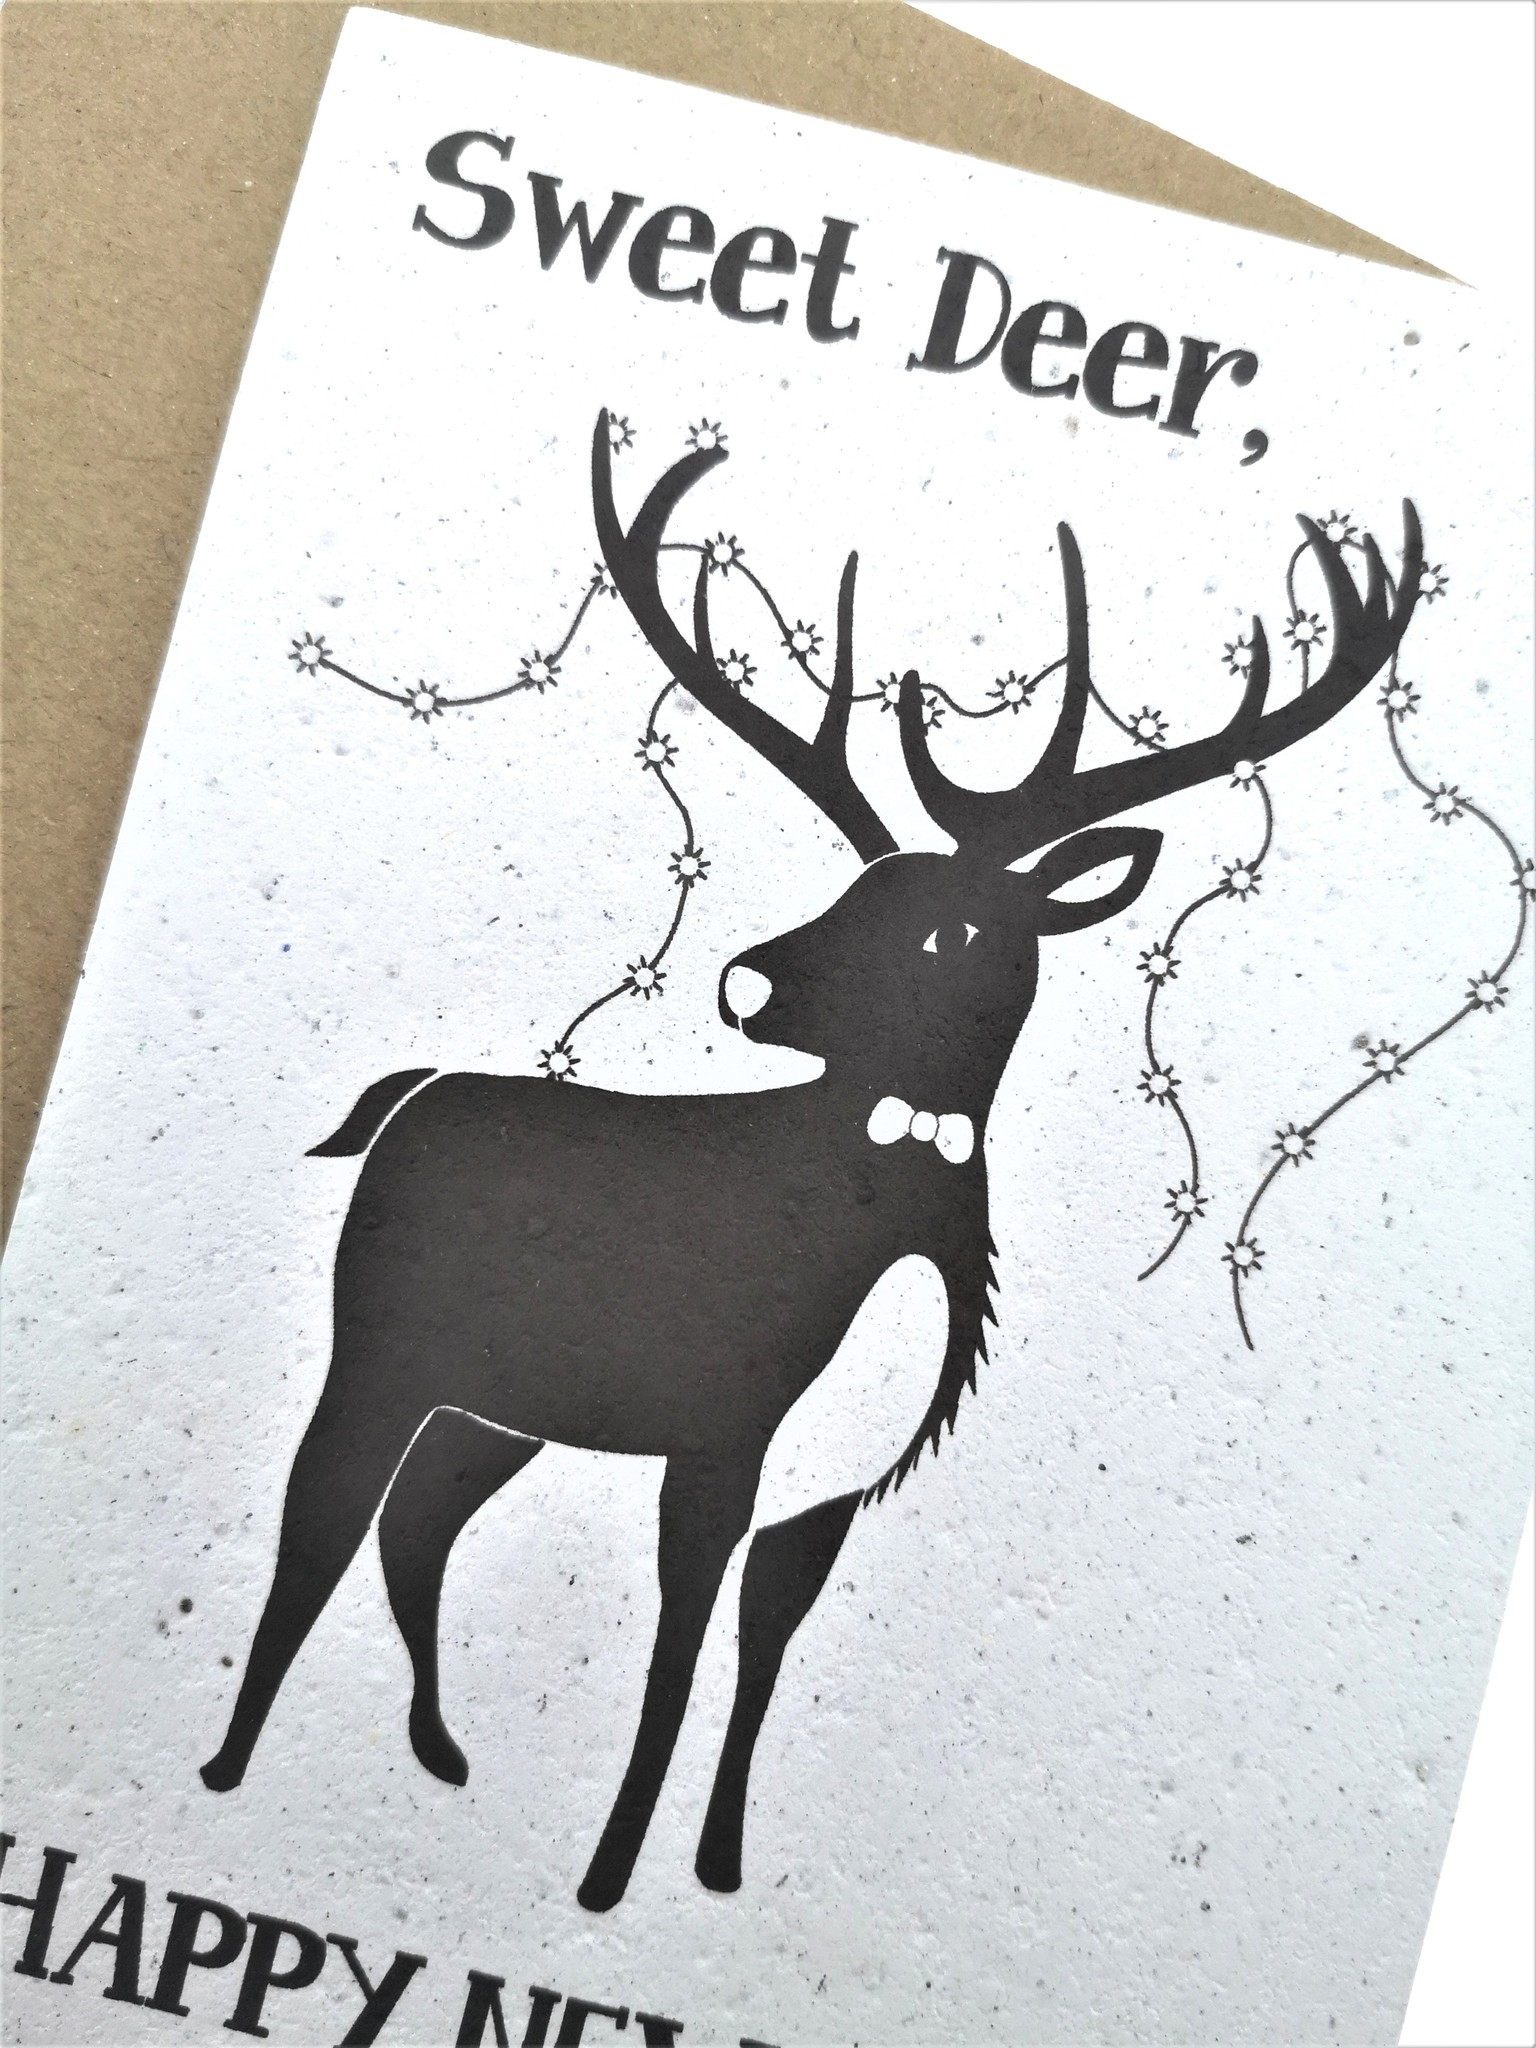 Plantbare kaart -Happy New Year - Sweeet Deer-1